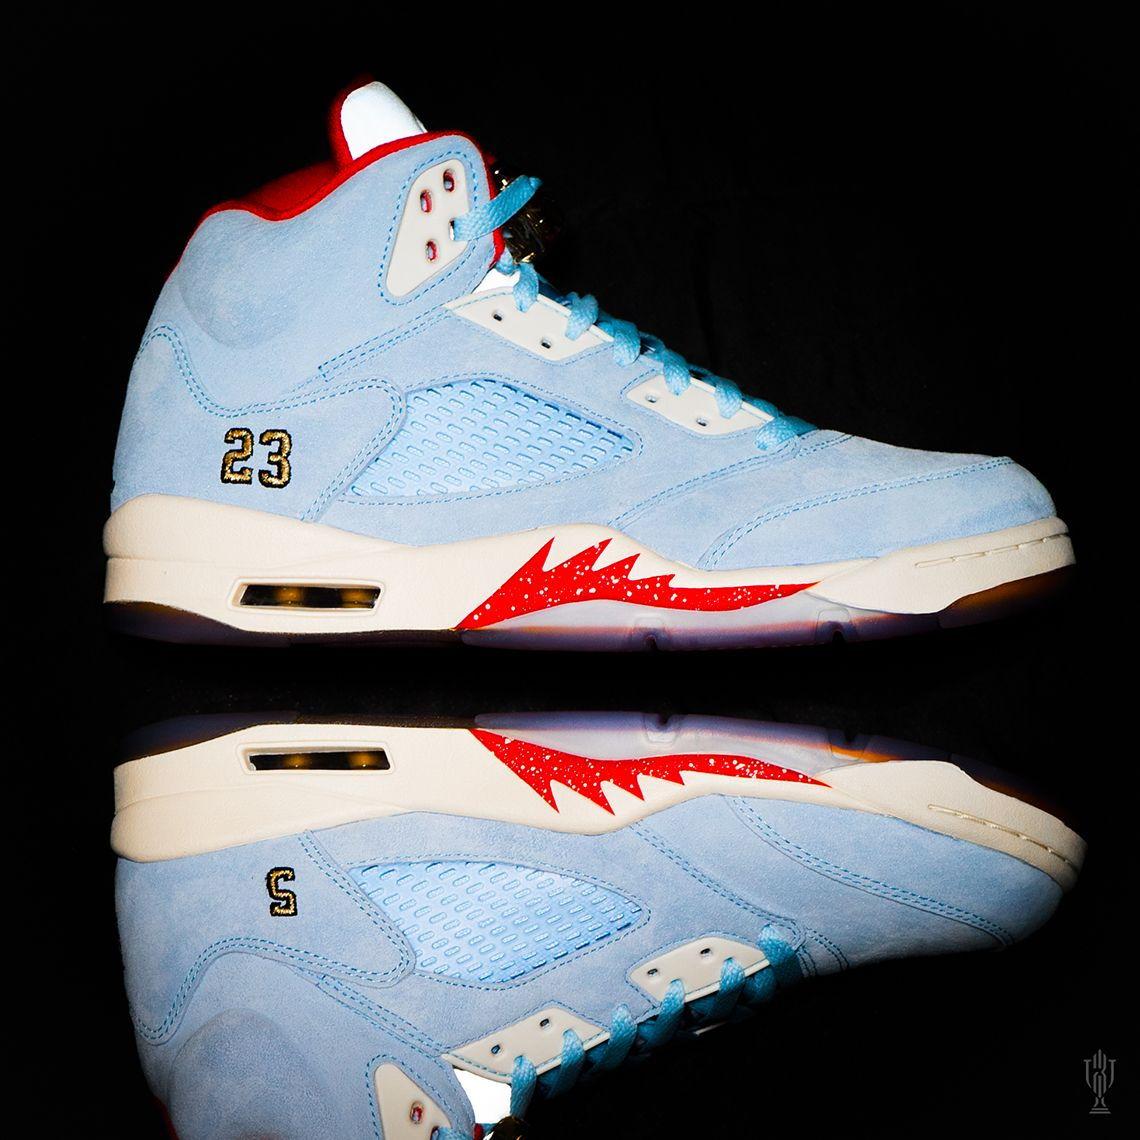 8eca42b6cb2 The Trophy Room x Air Jordan 5 Releases This Weekend   Air Jordan in ...